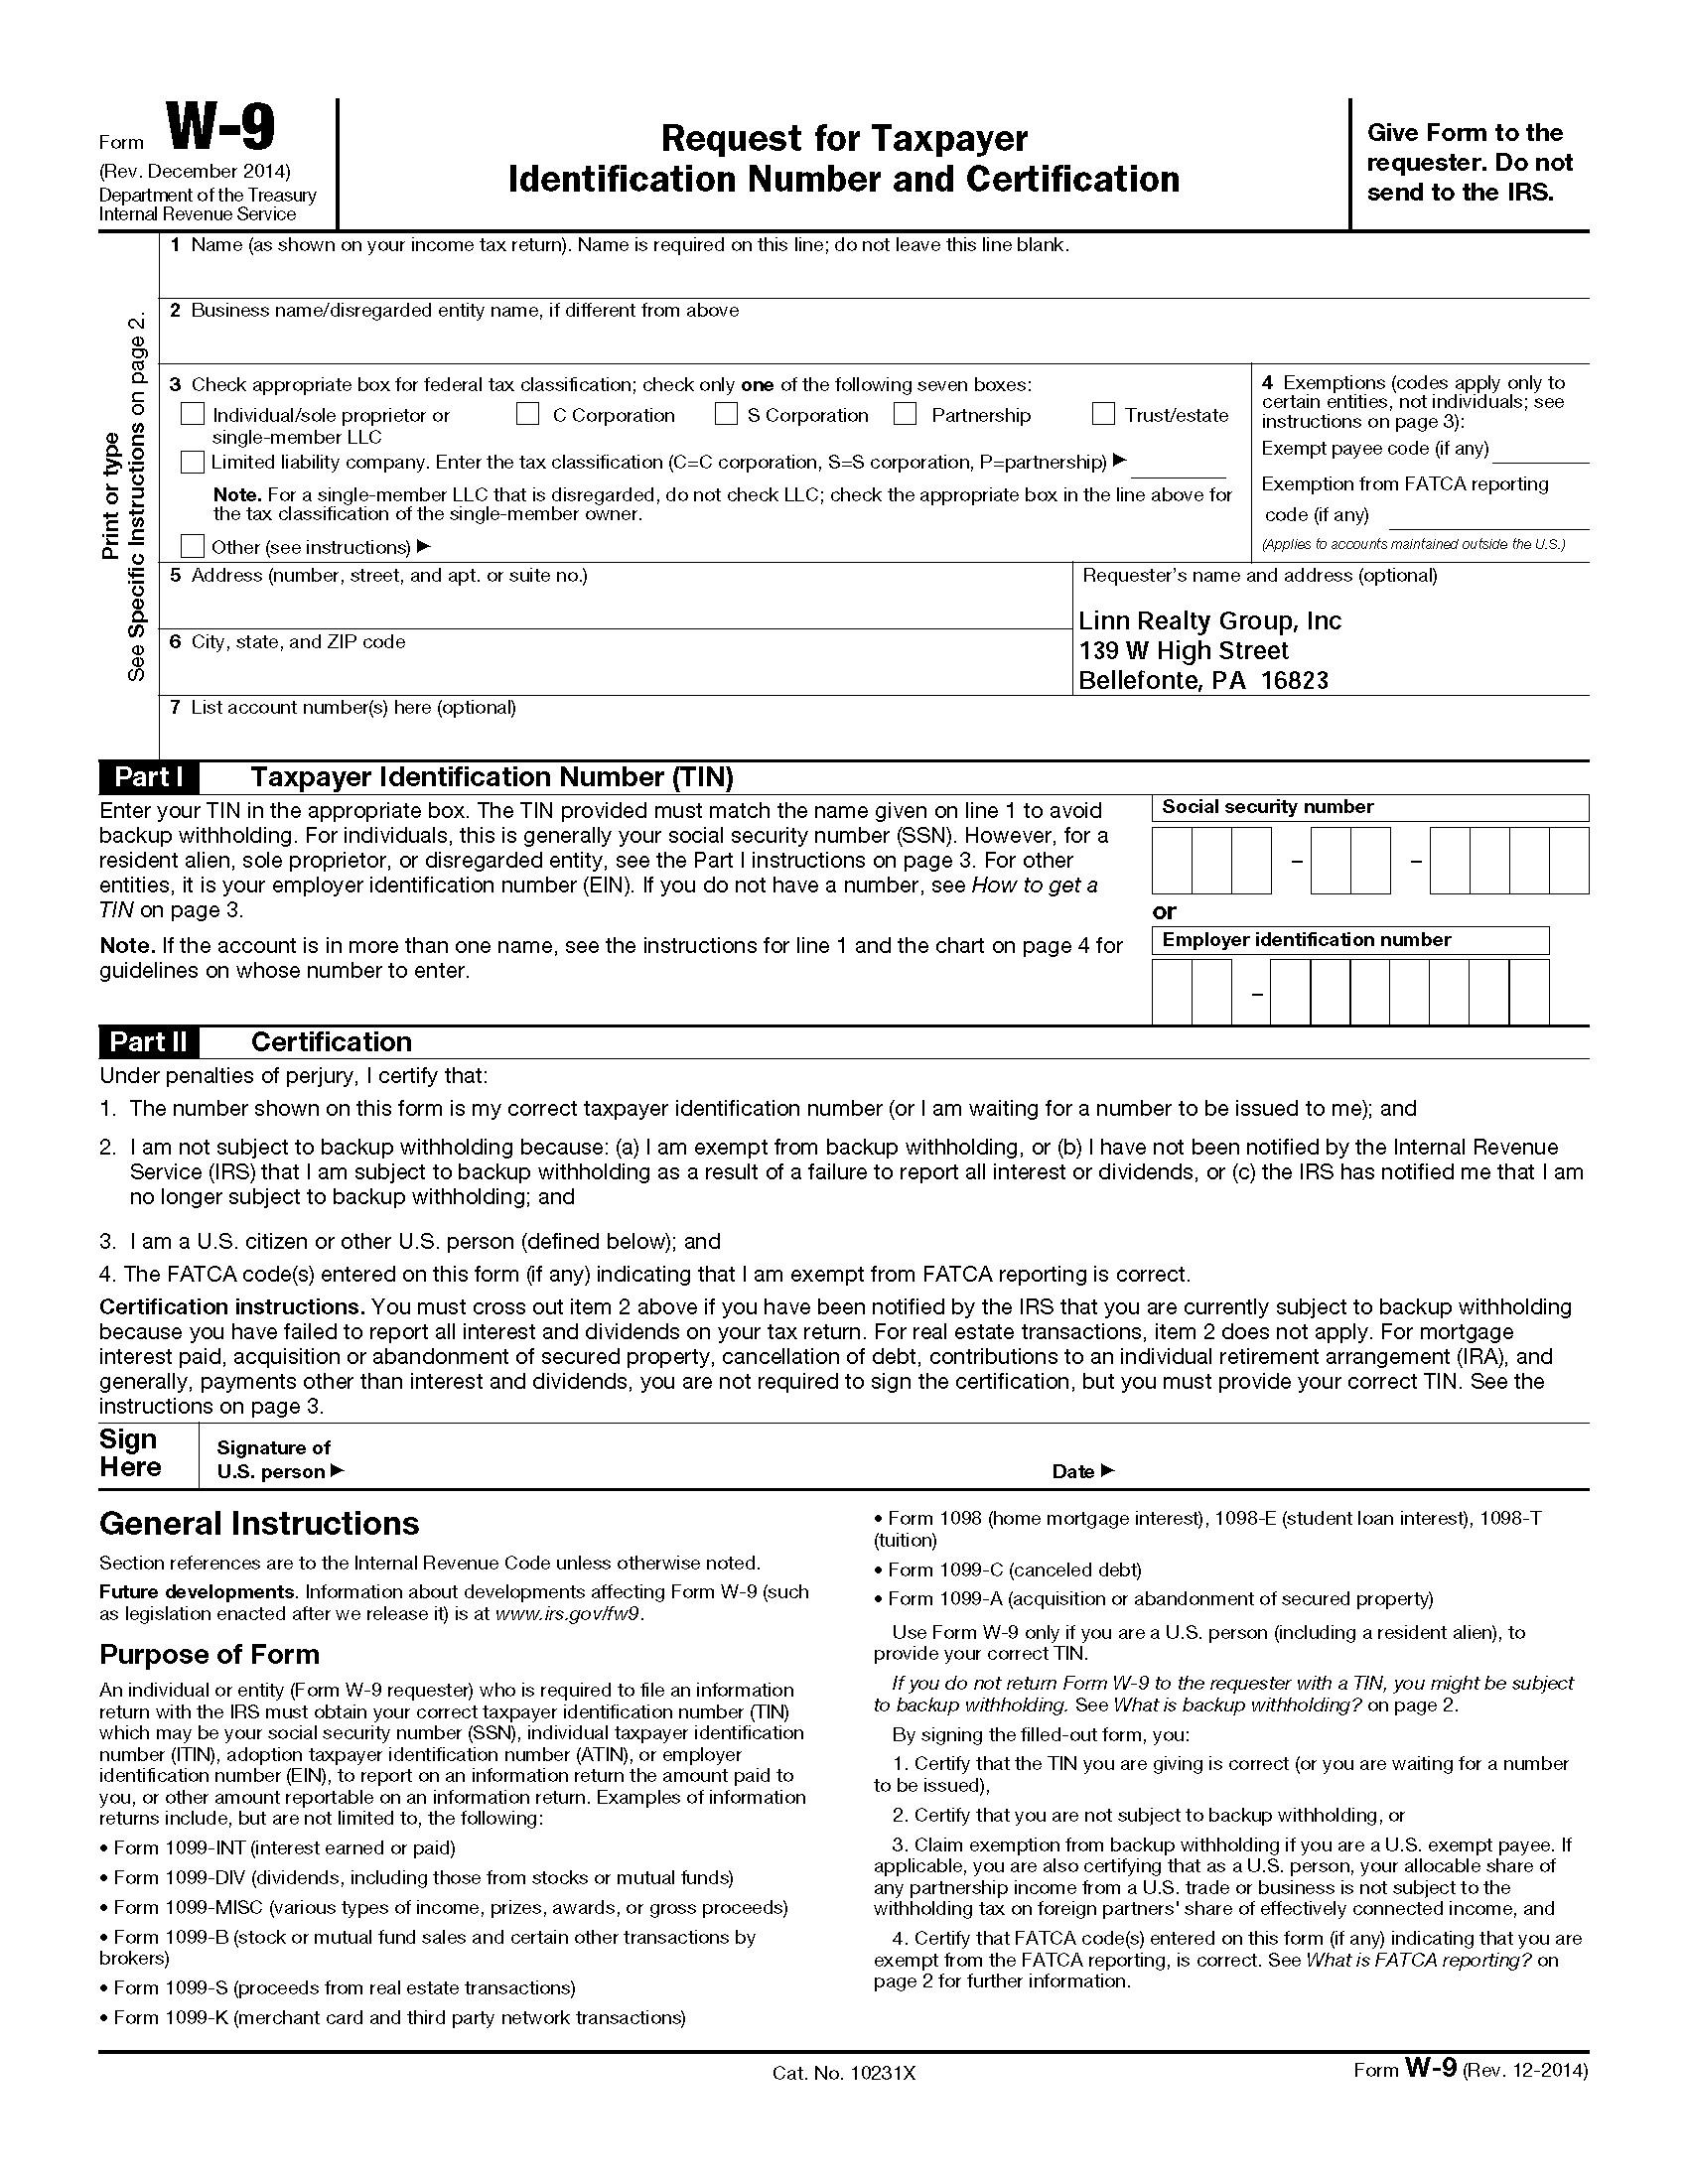 W-9 Form 2021 Printable Pdf | Calendar Template Printable with regard to I-9 Form 2021 Printable Form